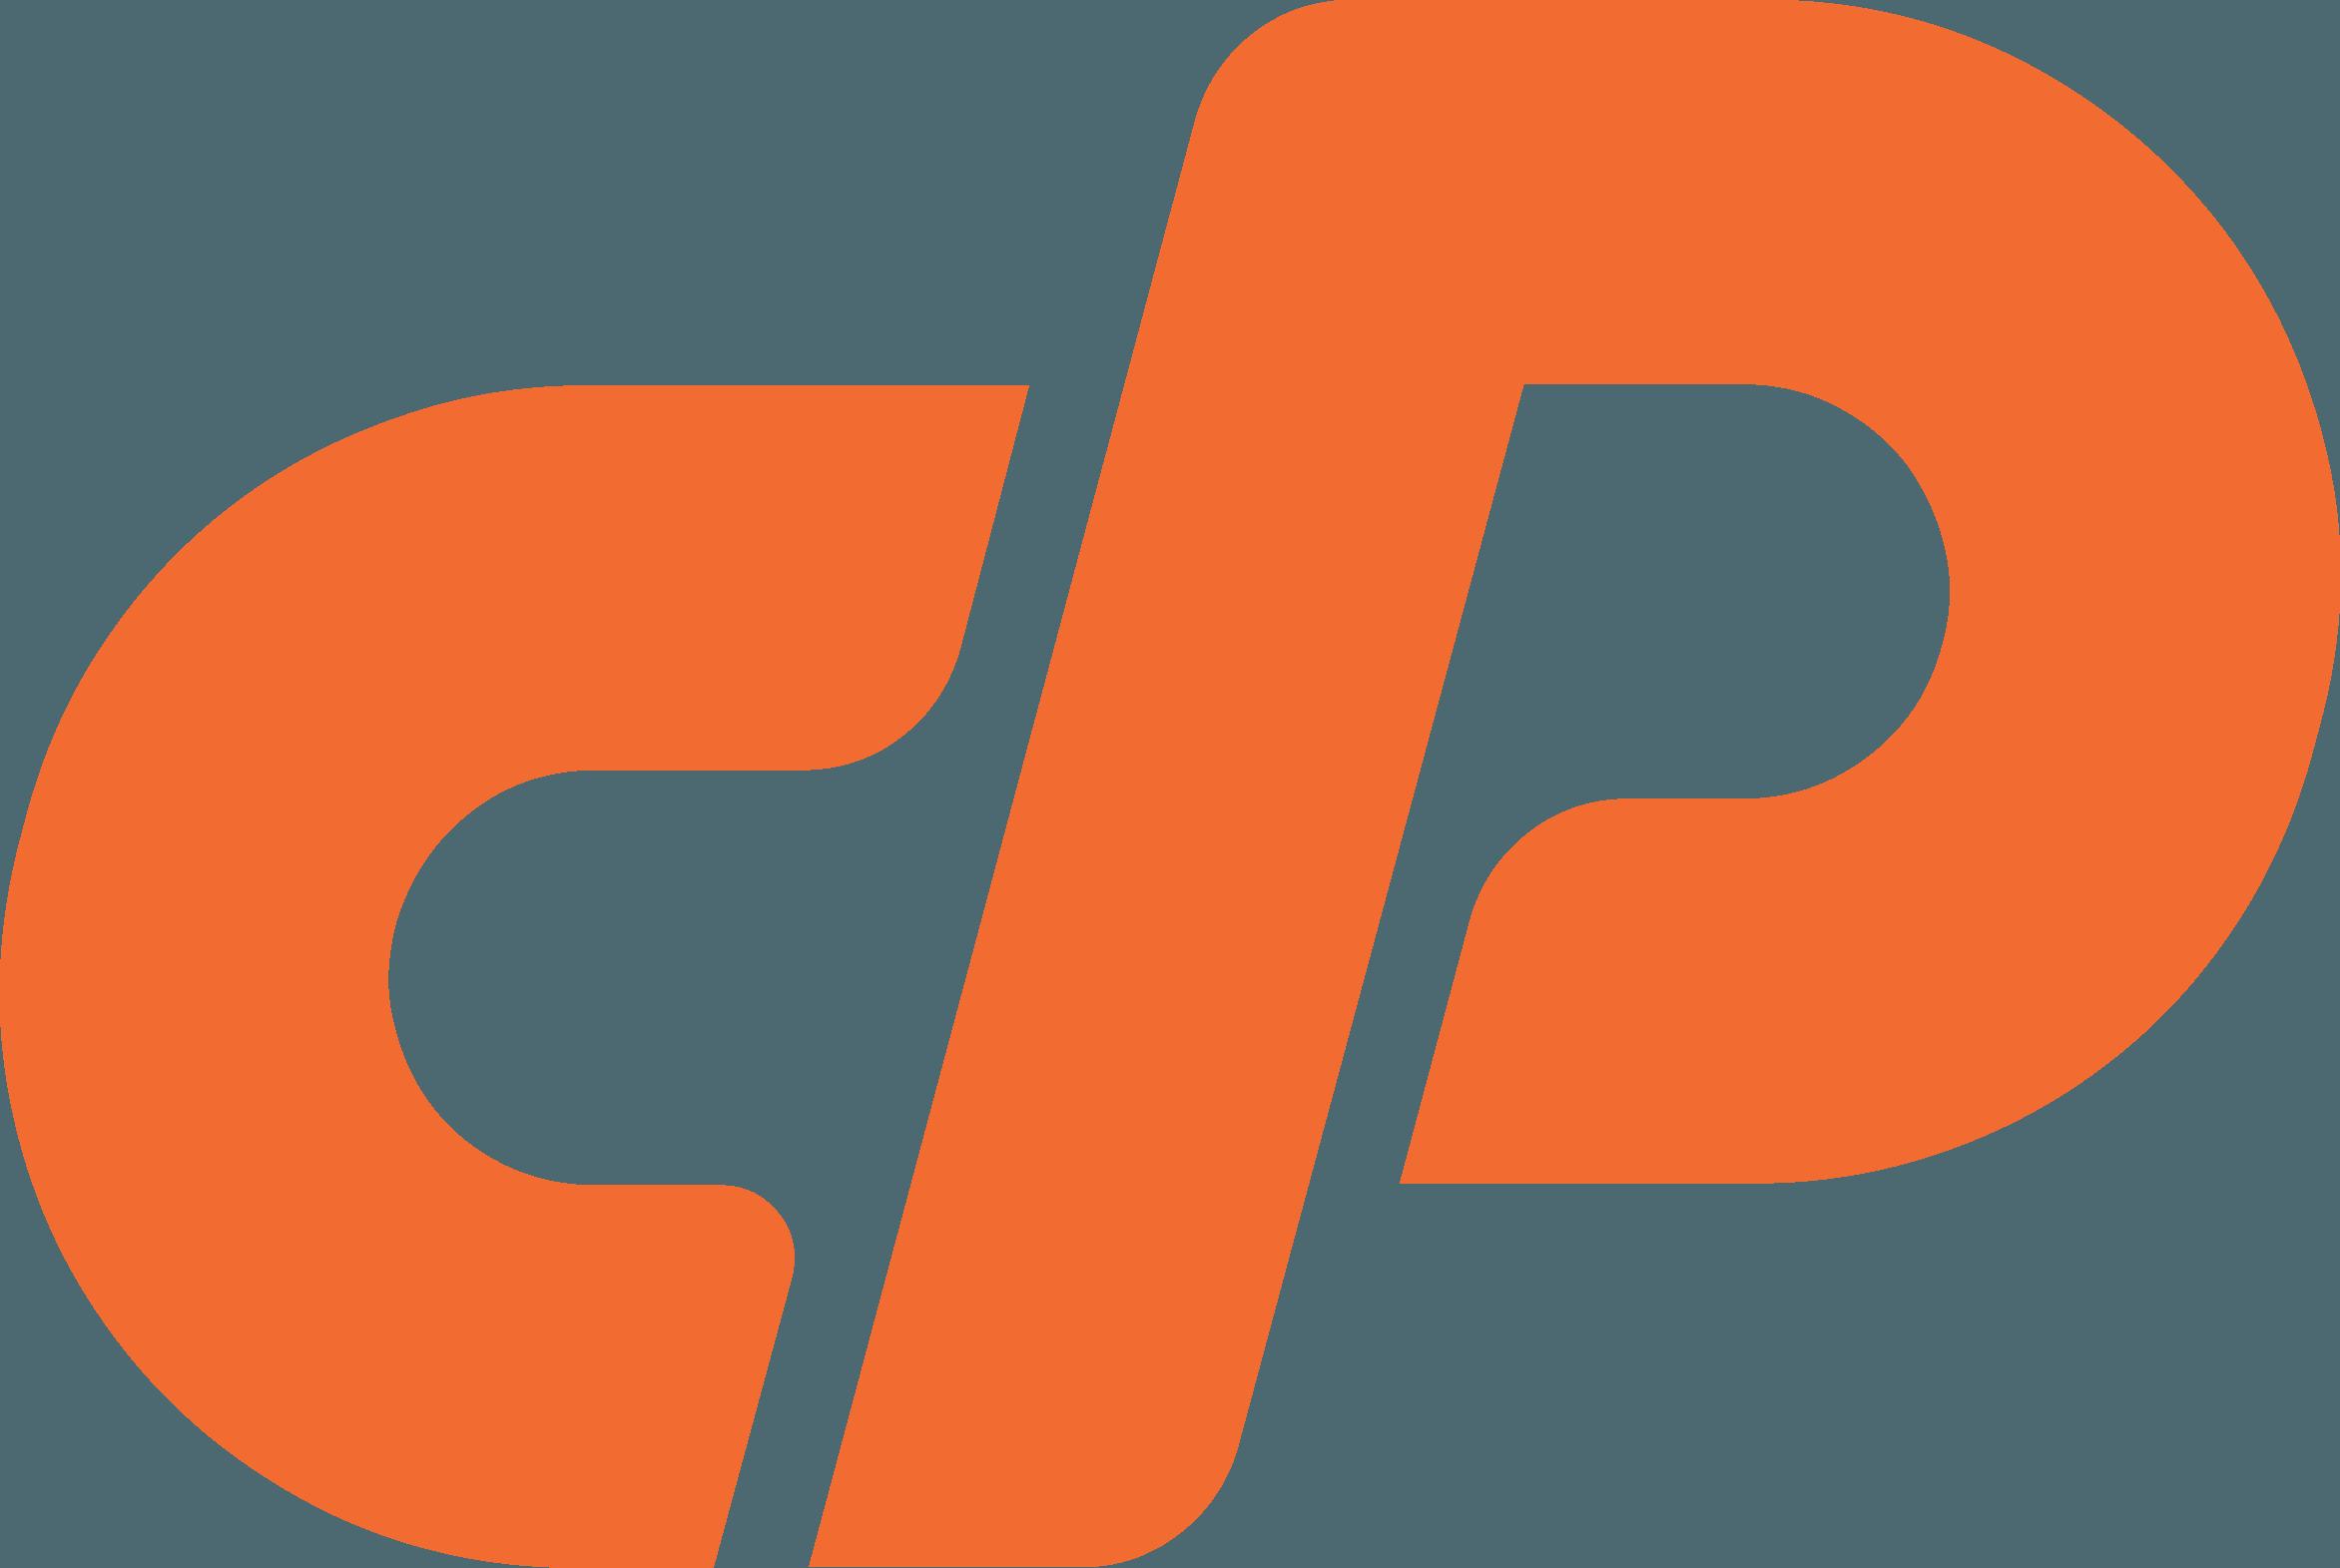 cpanel-logo1